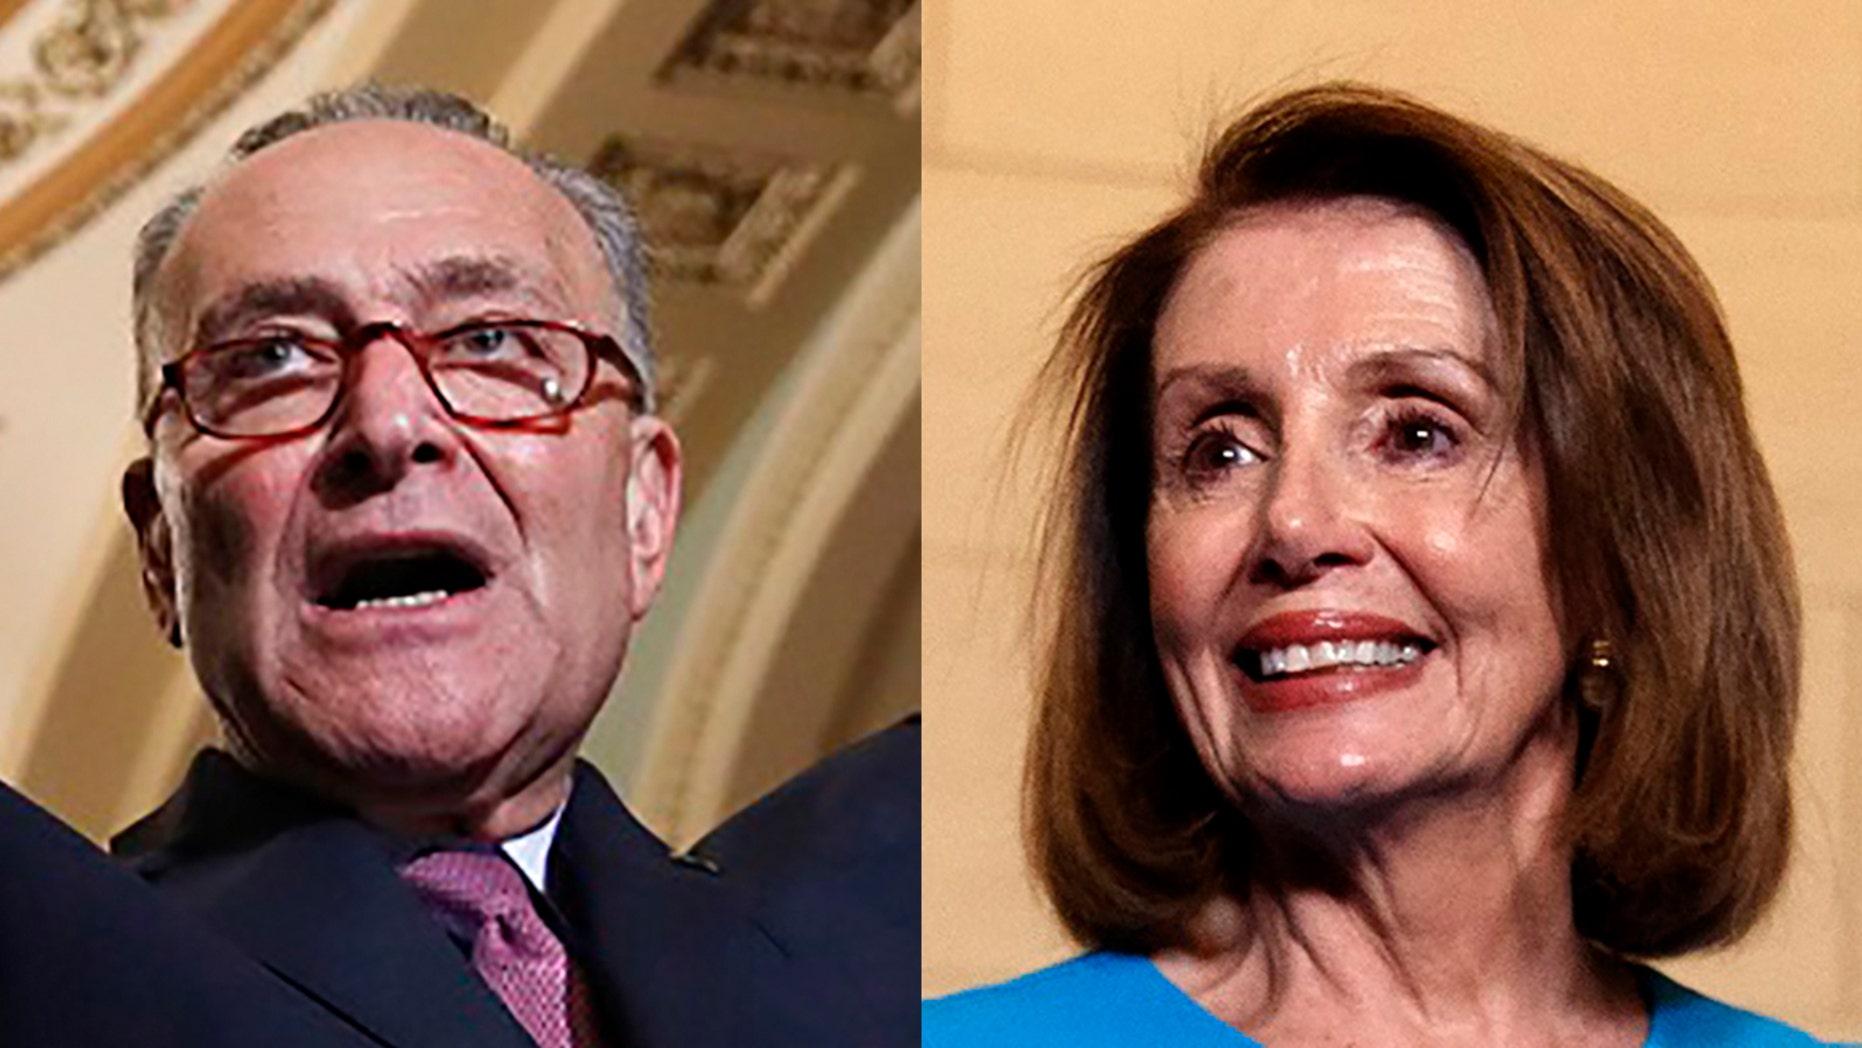 Sen. Chuck Schumer and US Representative Nancy Pelosi will meet with President Trump next week, Fox News has learned.